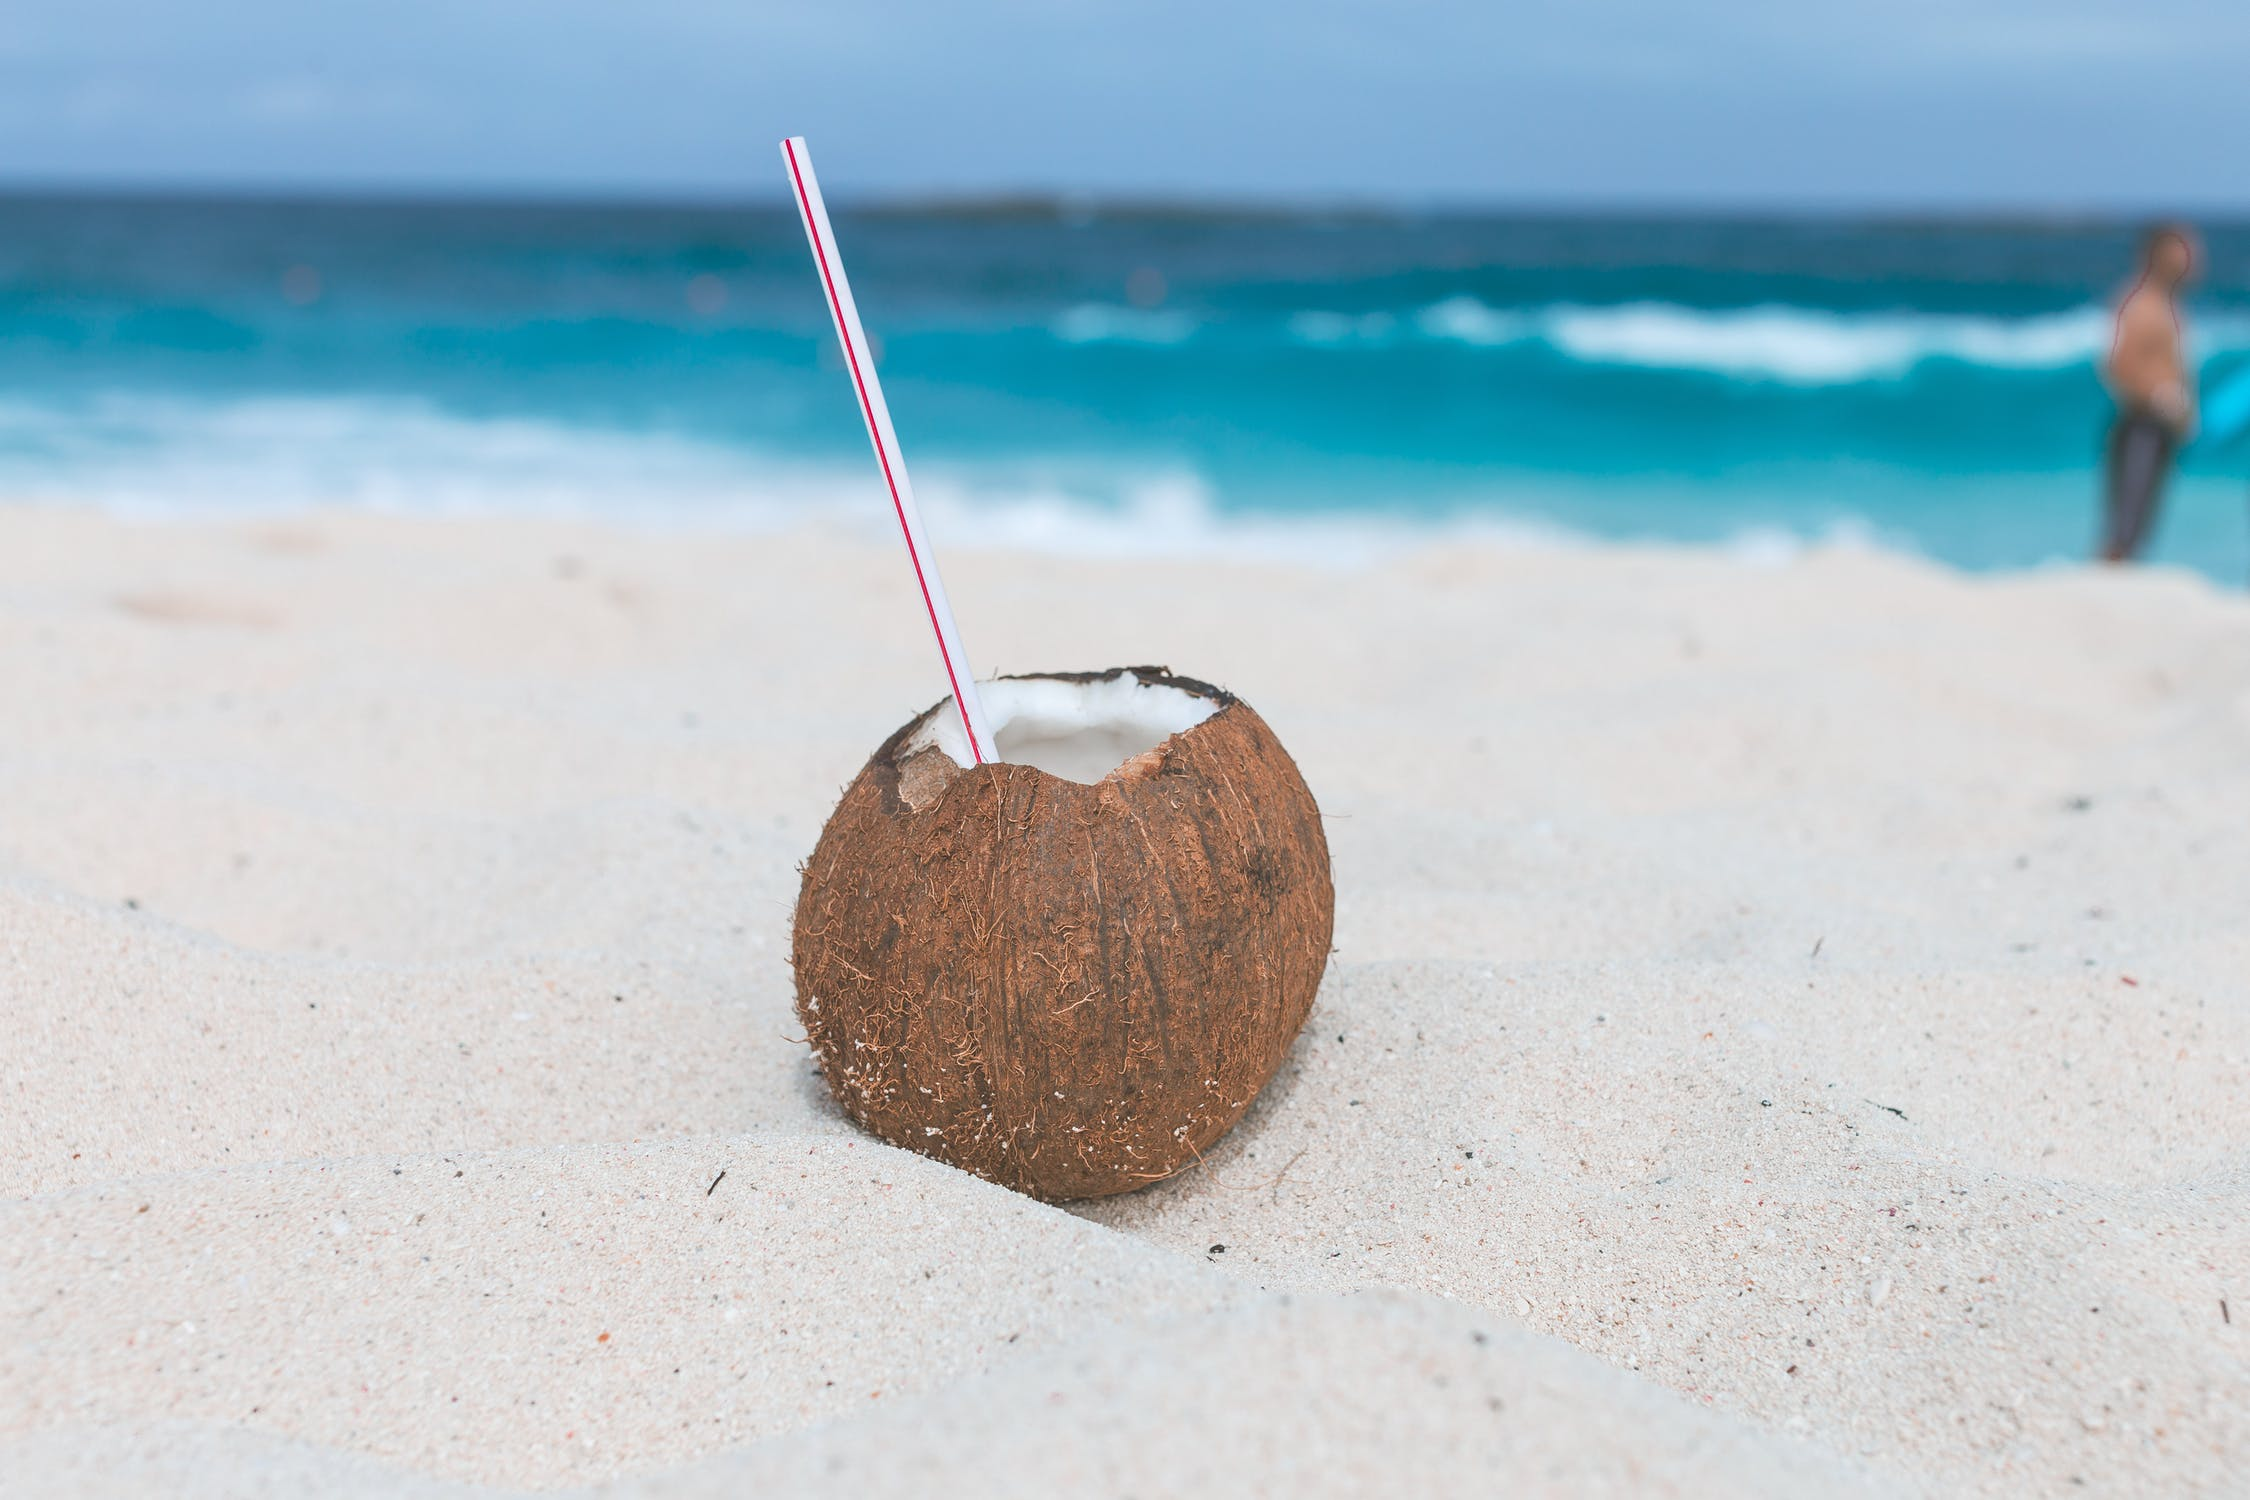 Matrac kokos pohánka